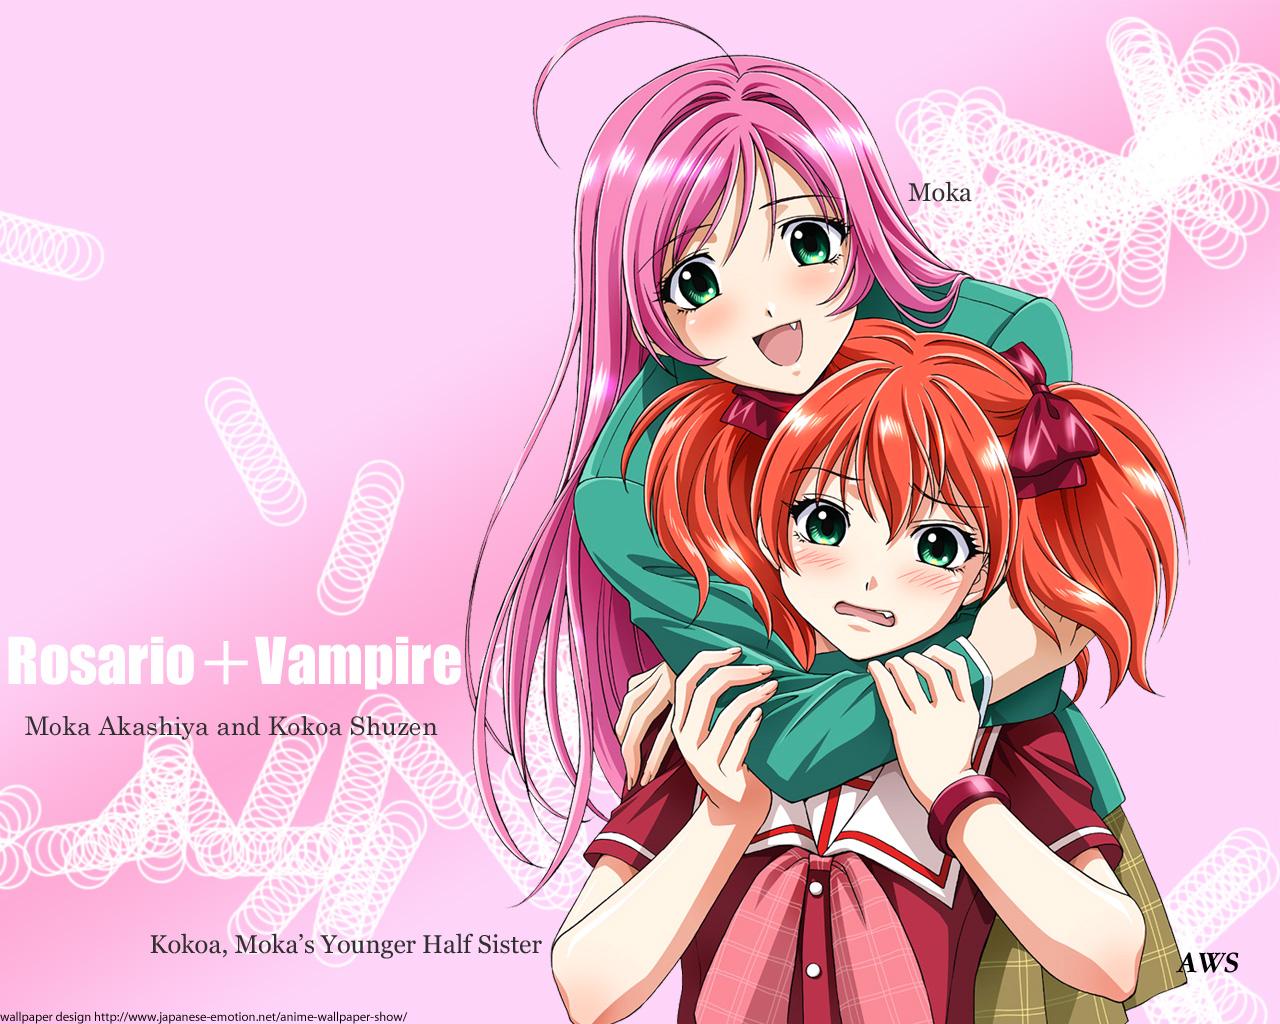 Megumi Animes RosarioVampire